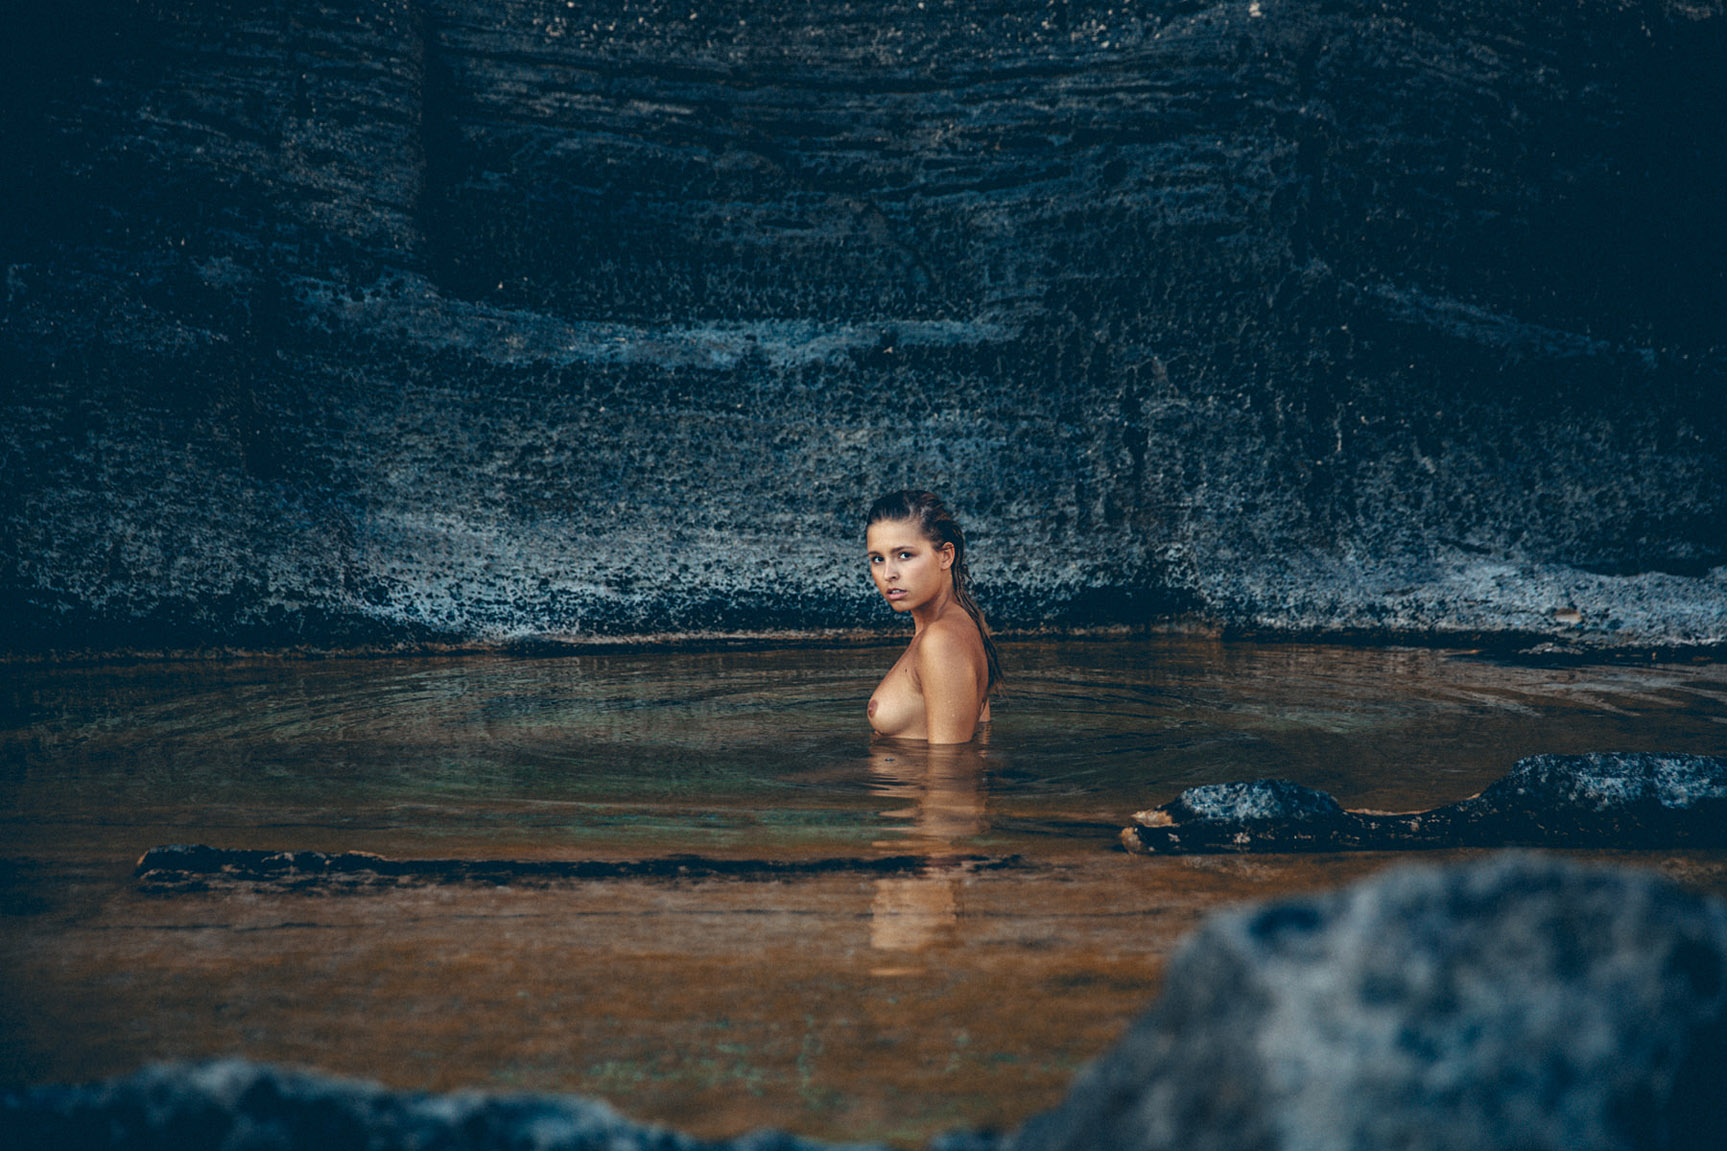 Жительница Атлантиды - Мариса Папен / Marisa Papen by Jorg Billwitz - Atlantis / P Magazine #4